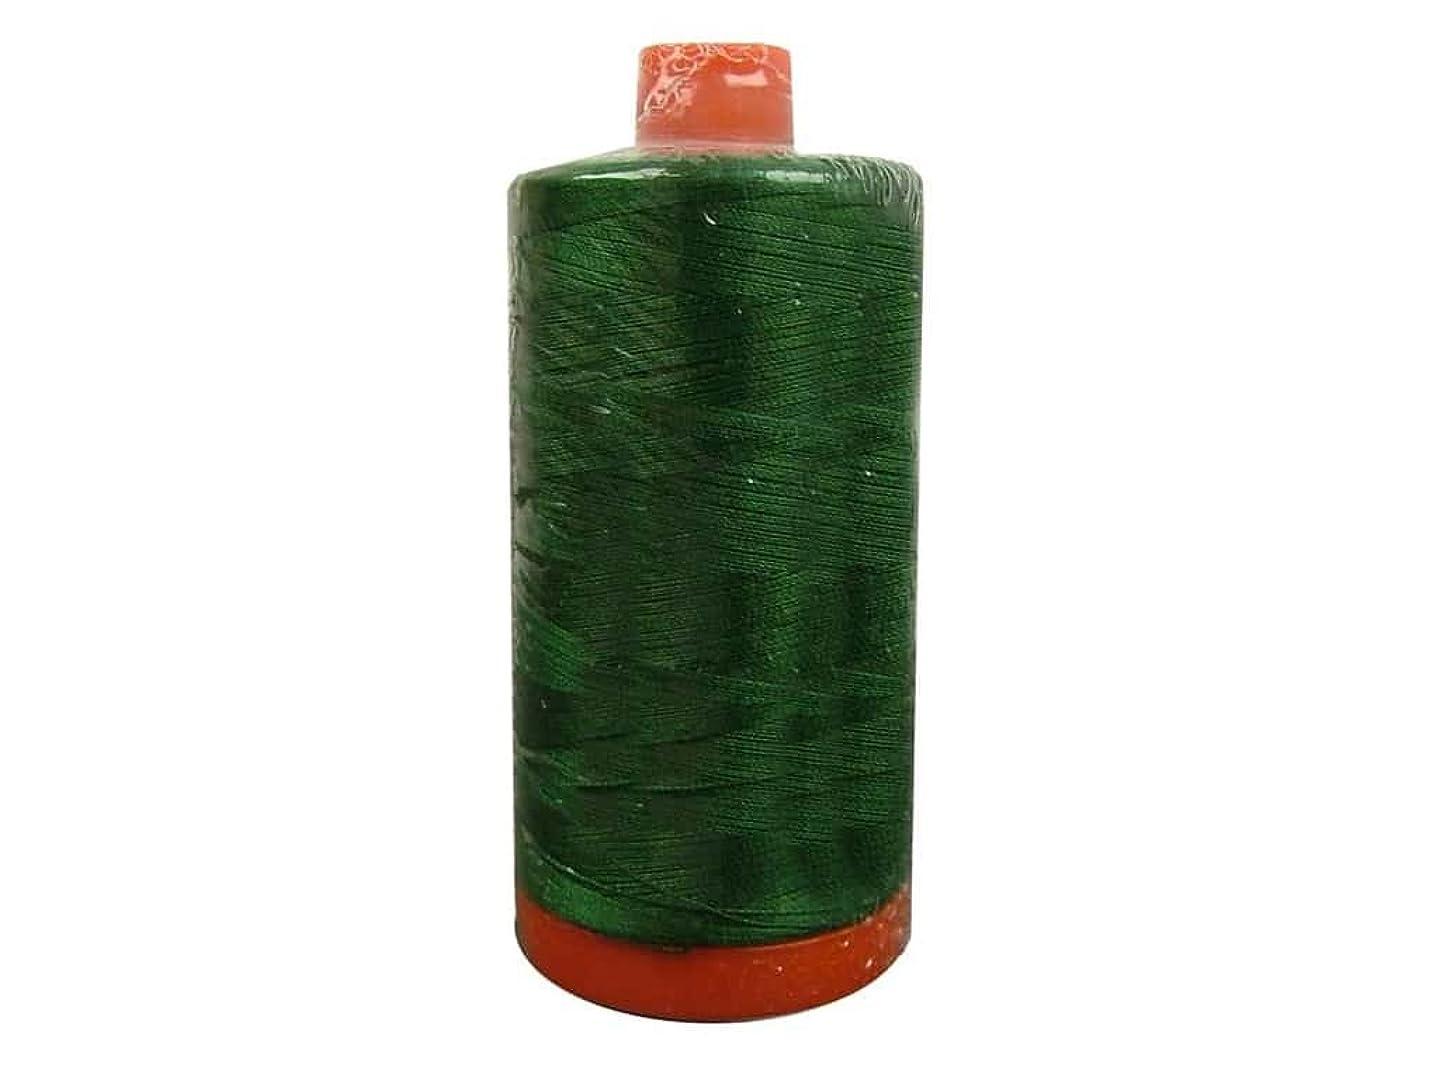 Aurifil Mako Cotton Quilting Thread 50 wt. Dark Green 1420 yd.